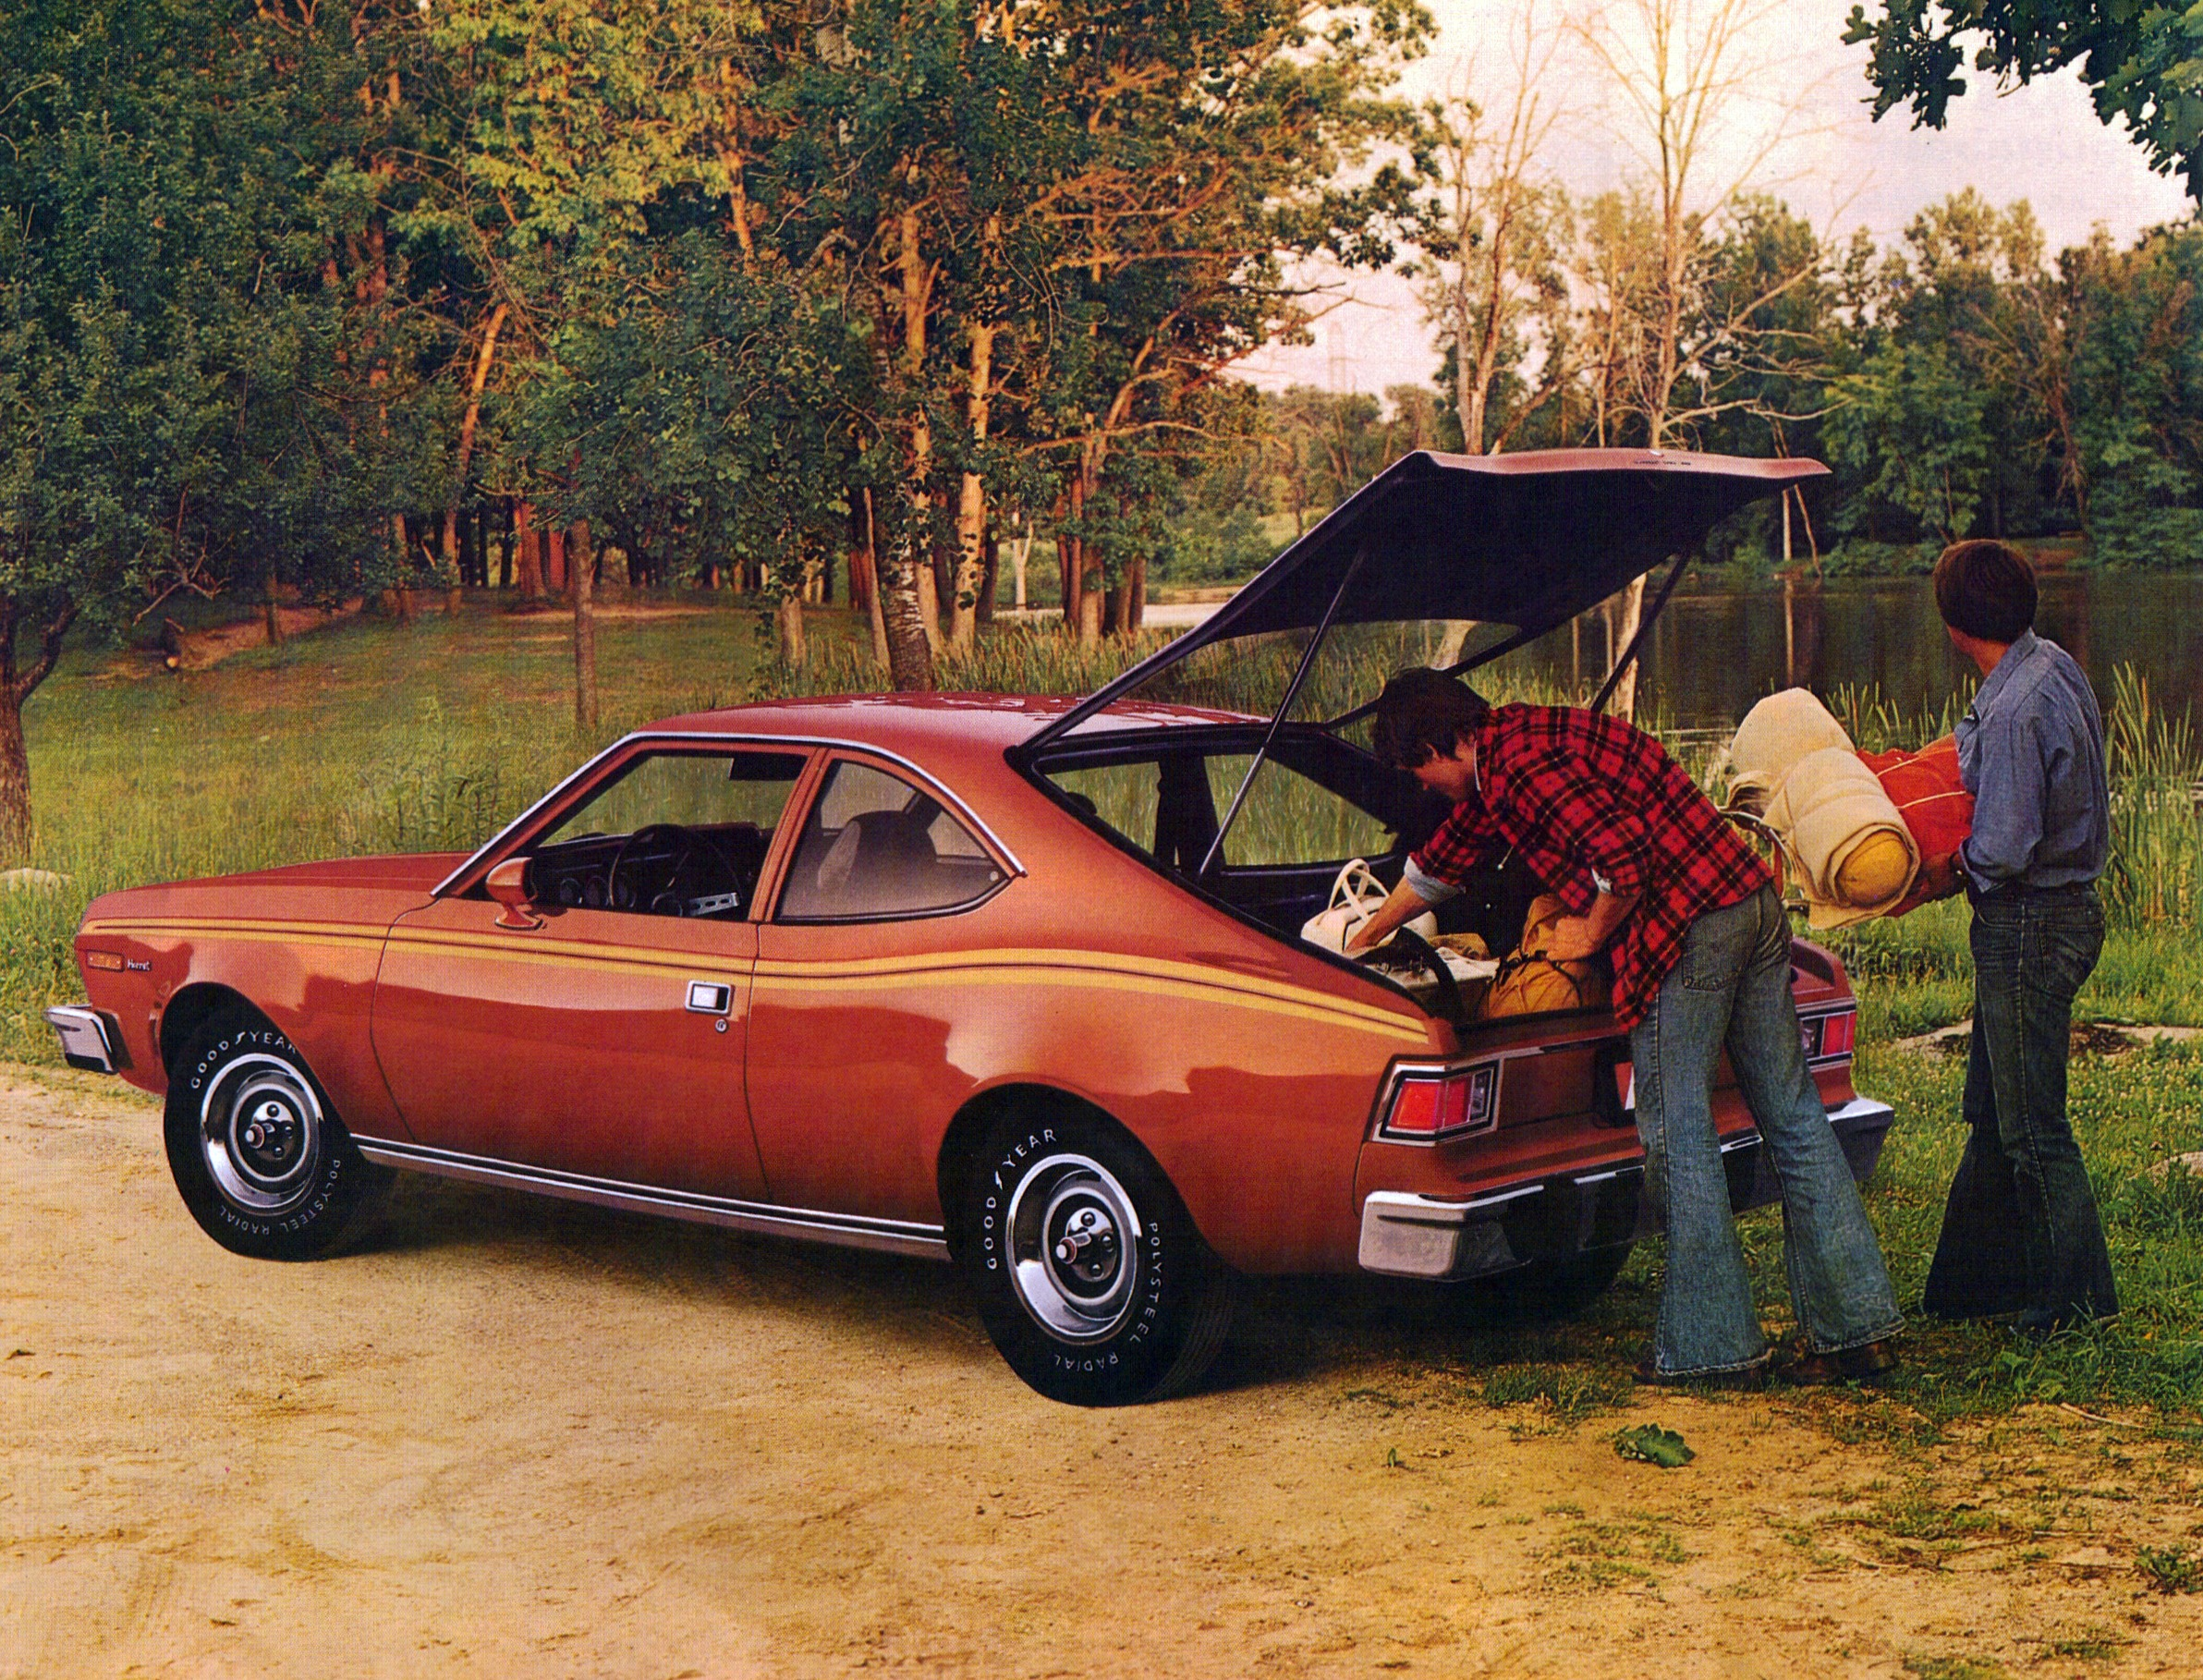 1974 Amc Hornet Hatchback For Sale | Autos Weblog